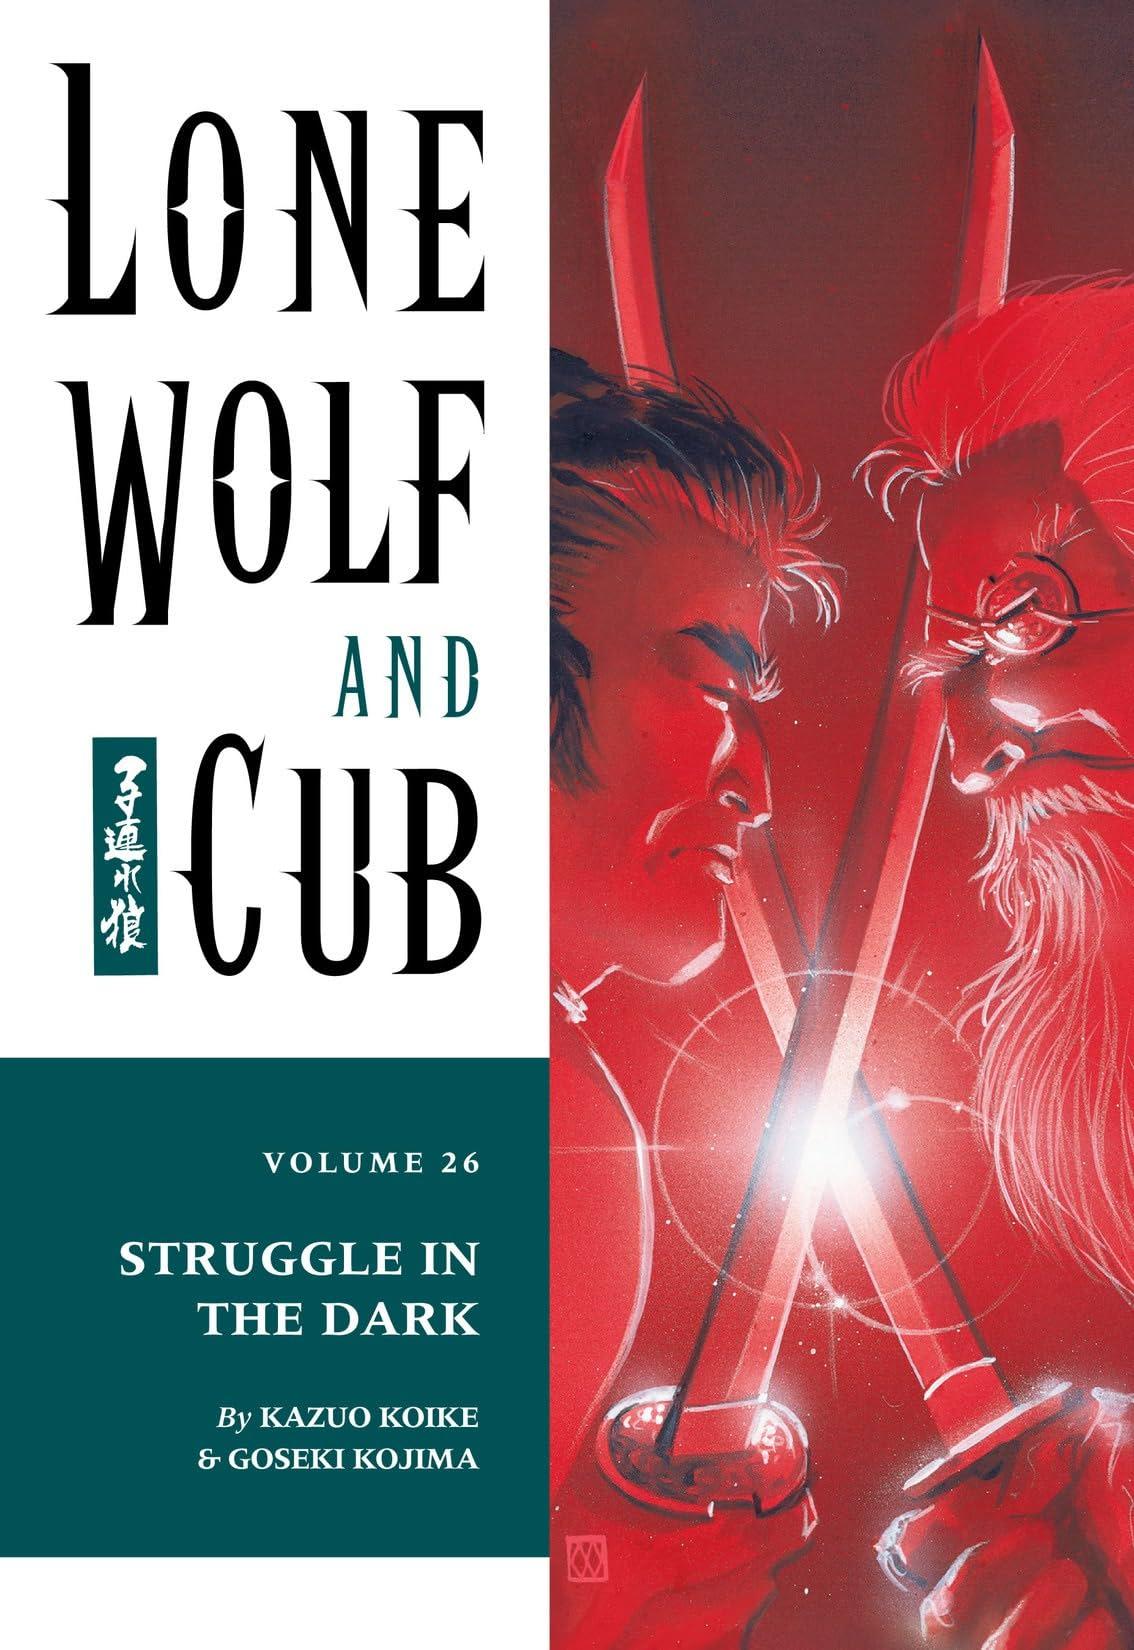 Lone Wolf and Cub Vol. 26: Struggle in the Dark